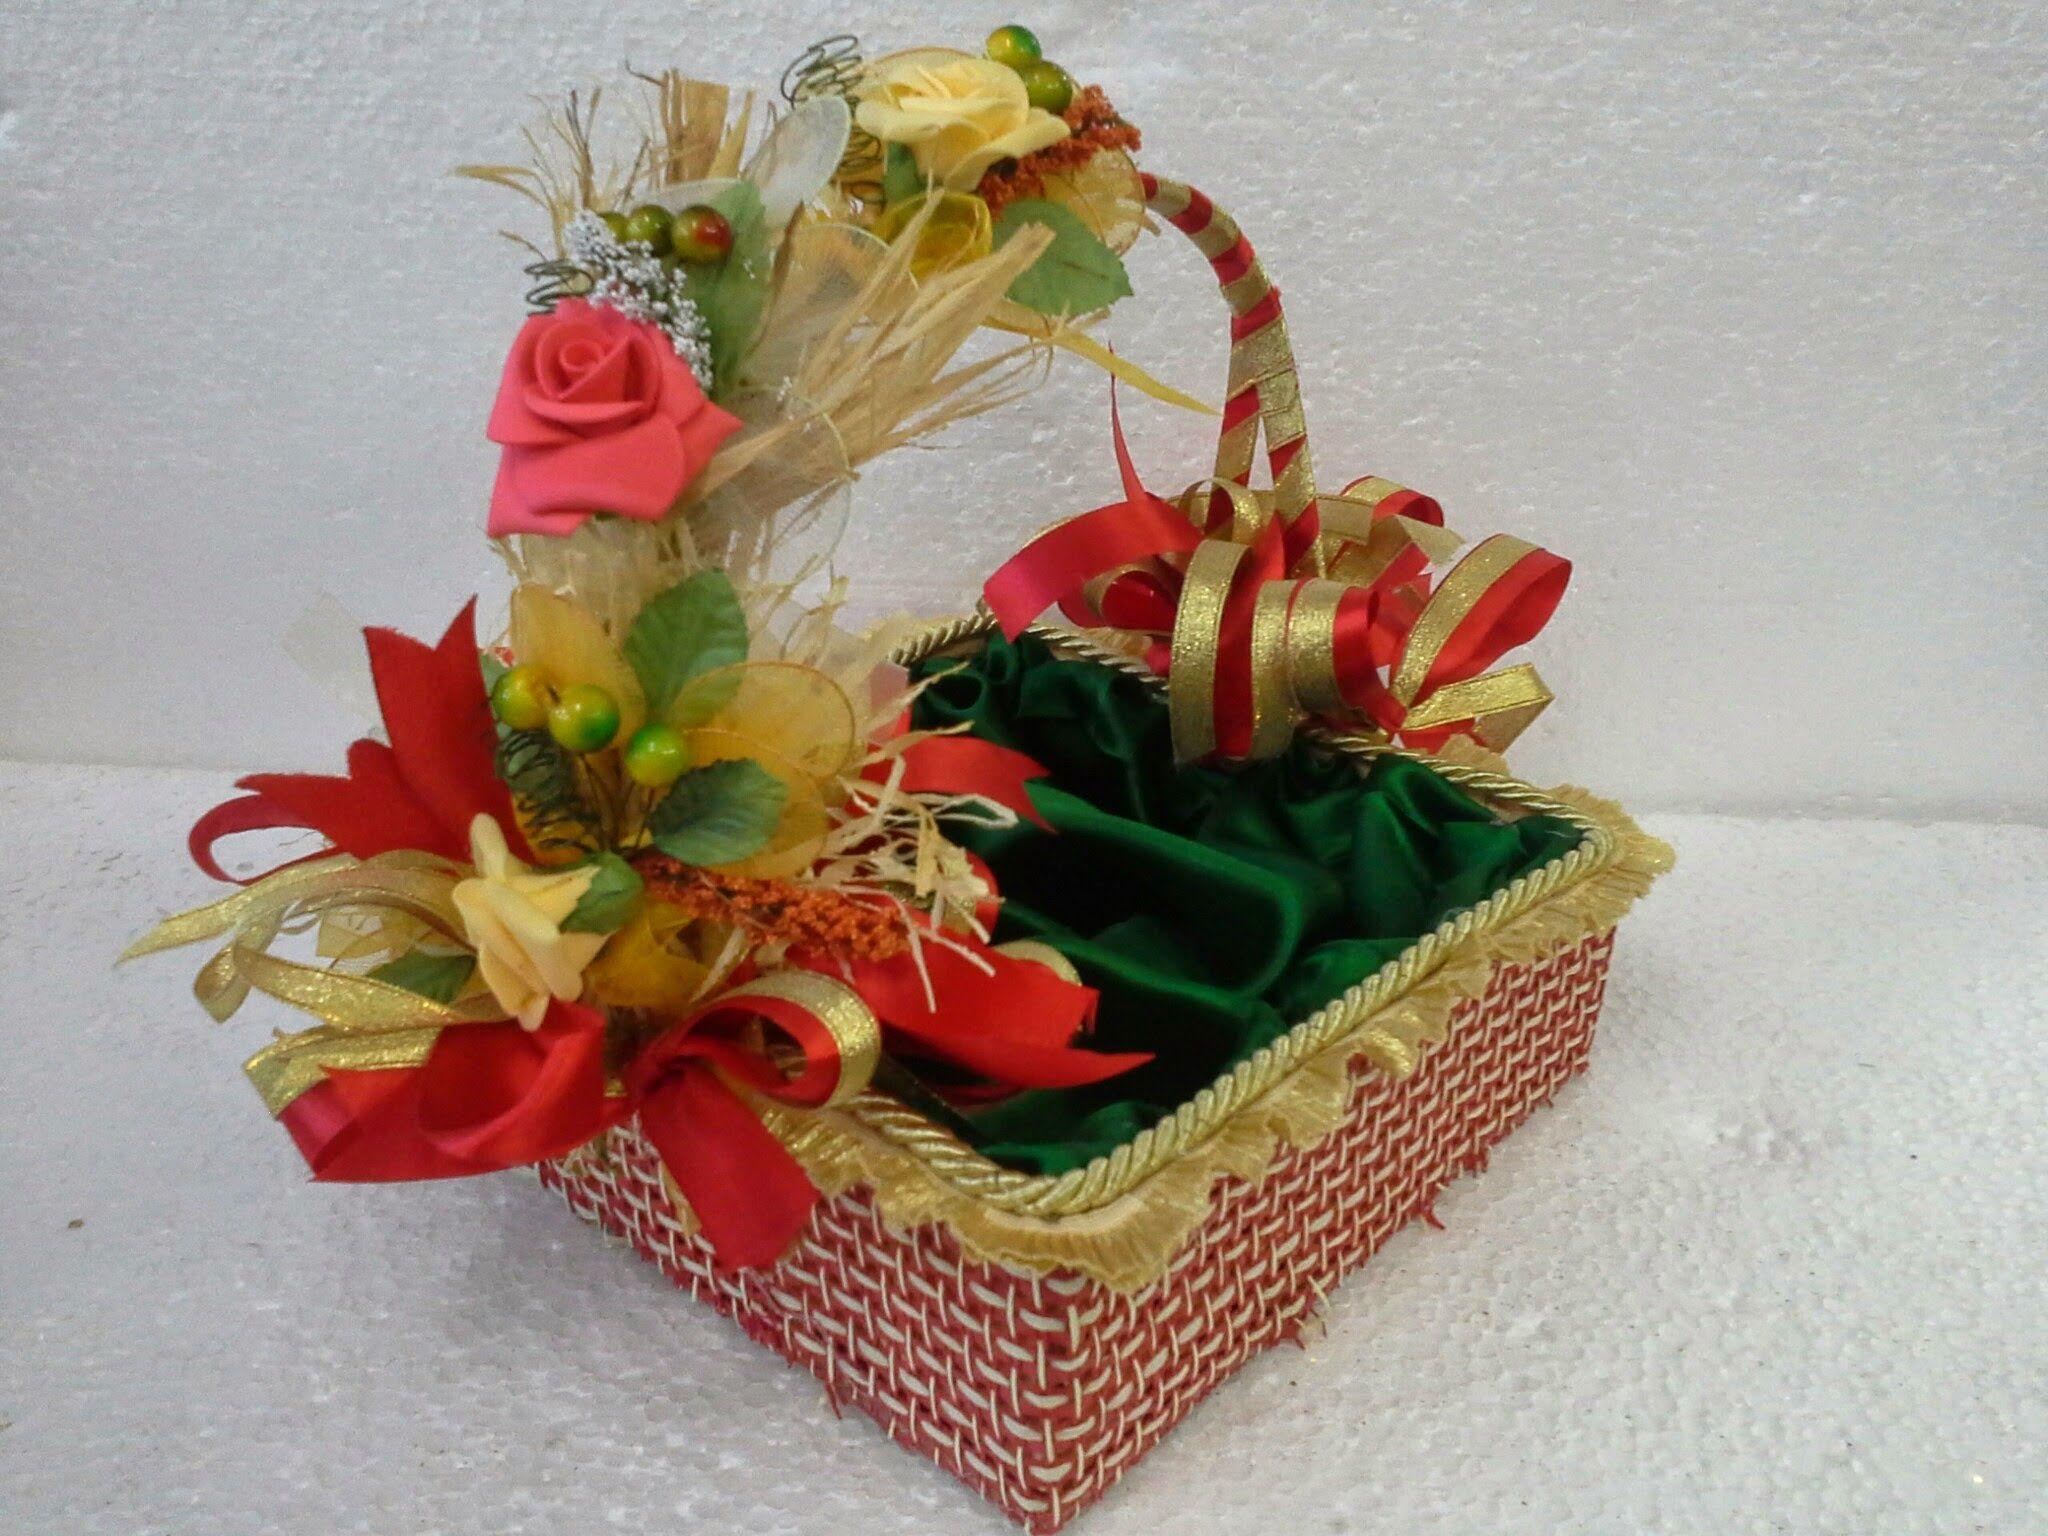 Basket Flower Decoration Class 3 Basket Decoration Gift Packing Course Pinterest